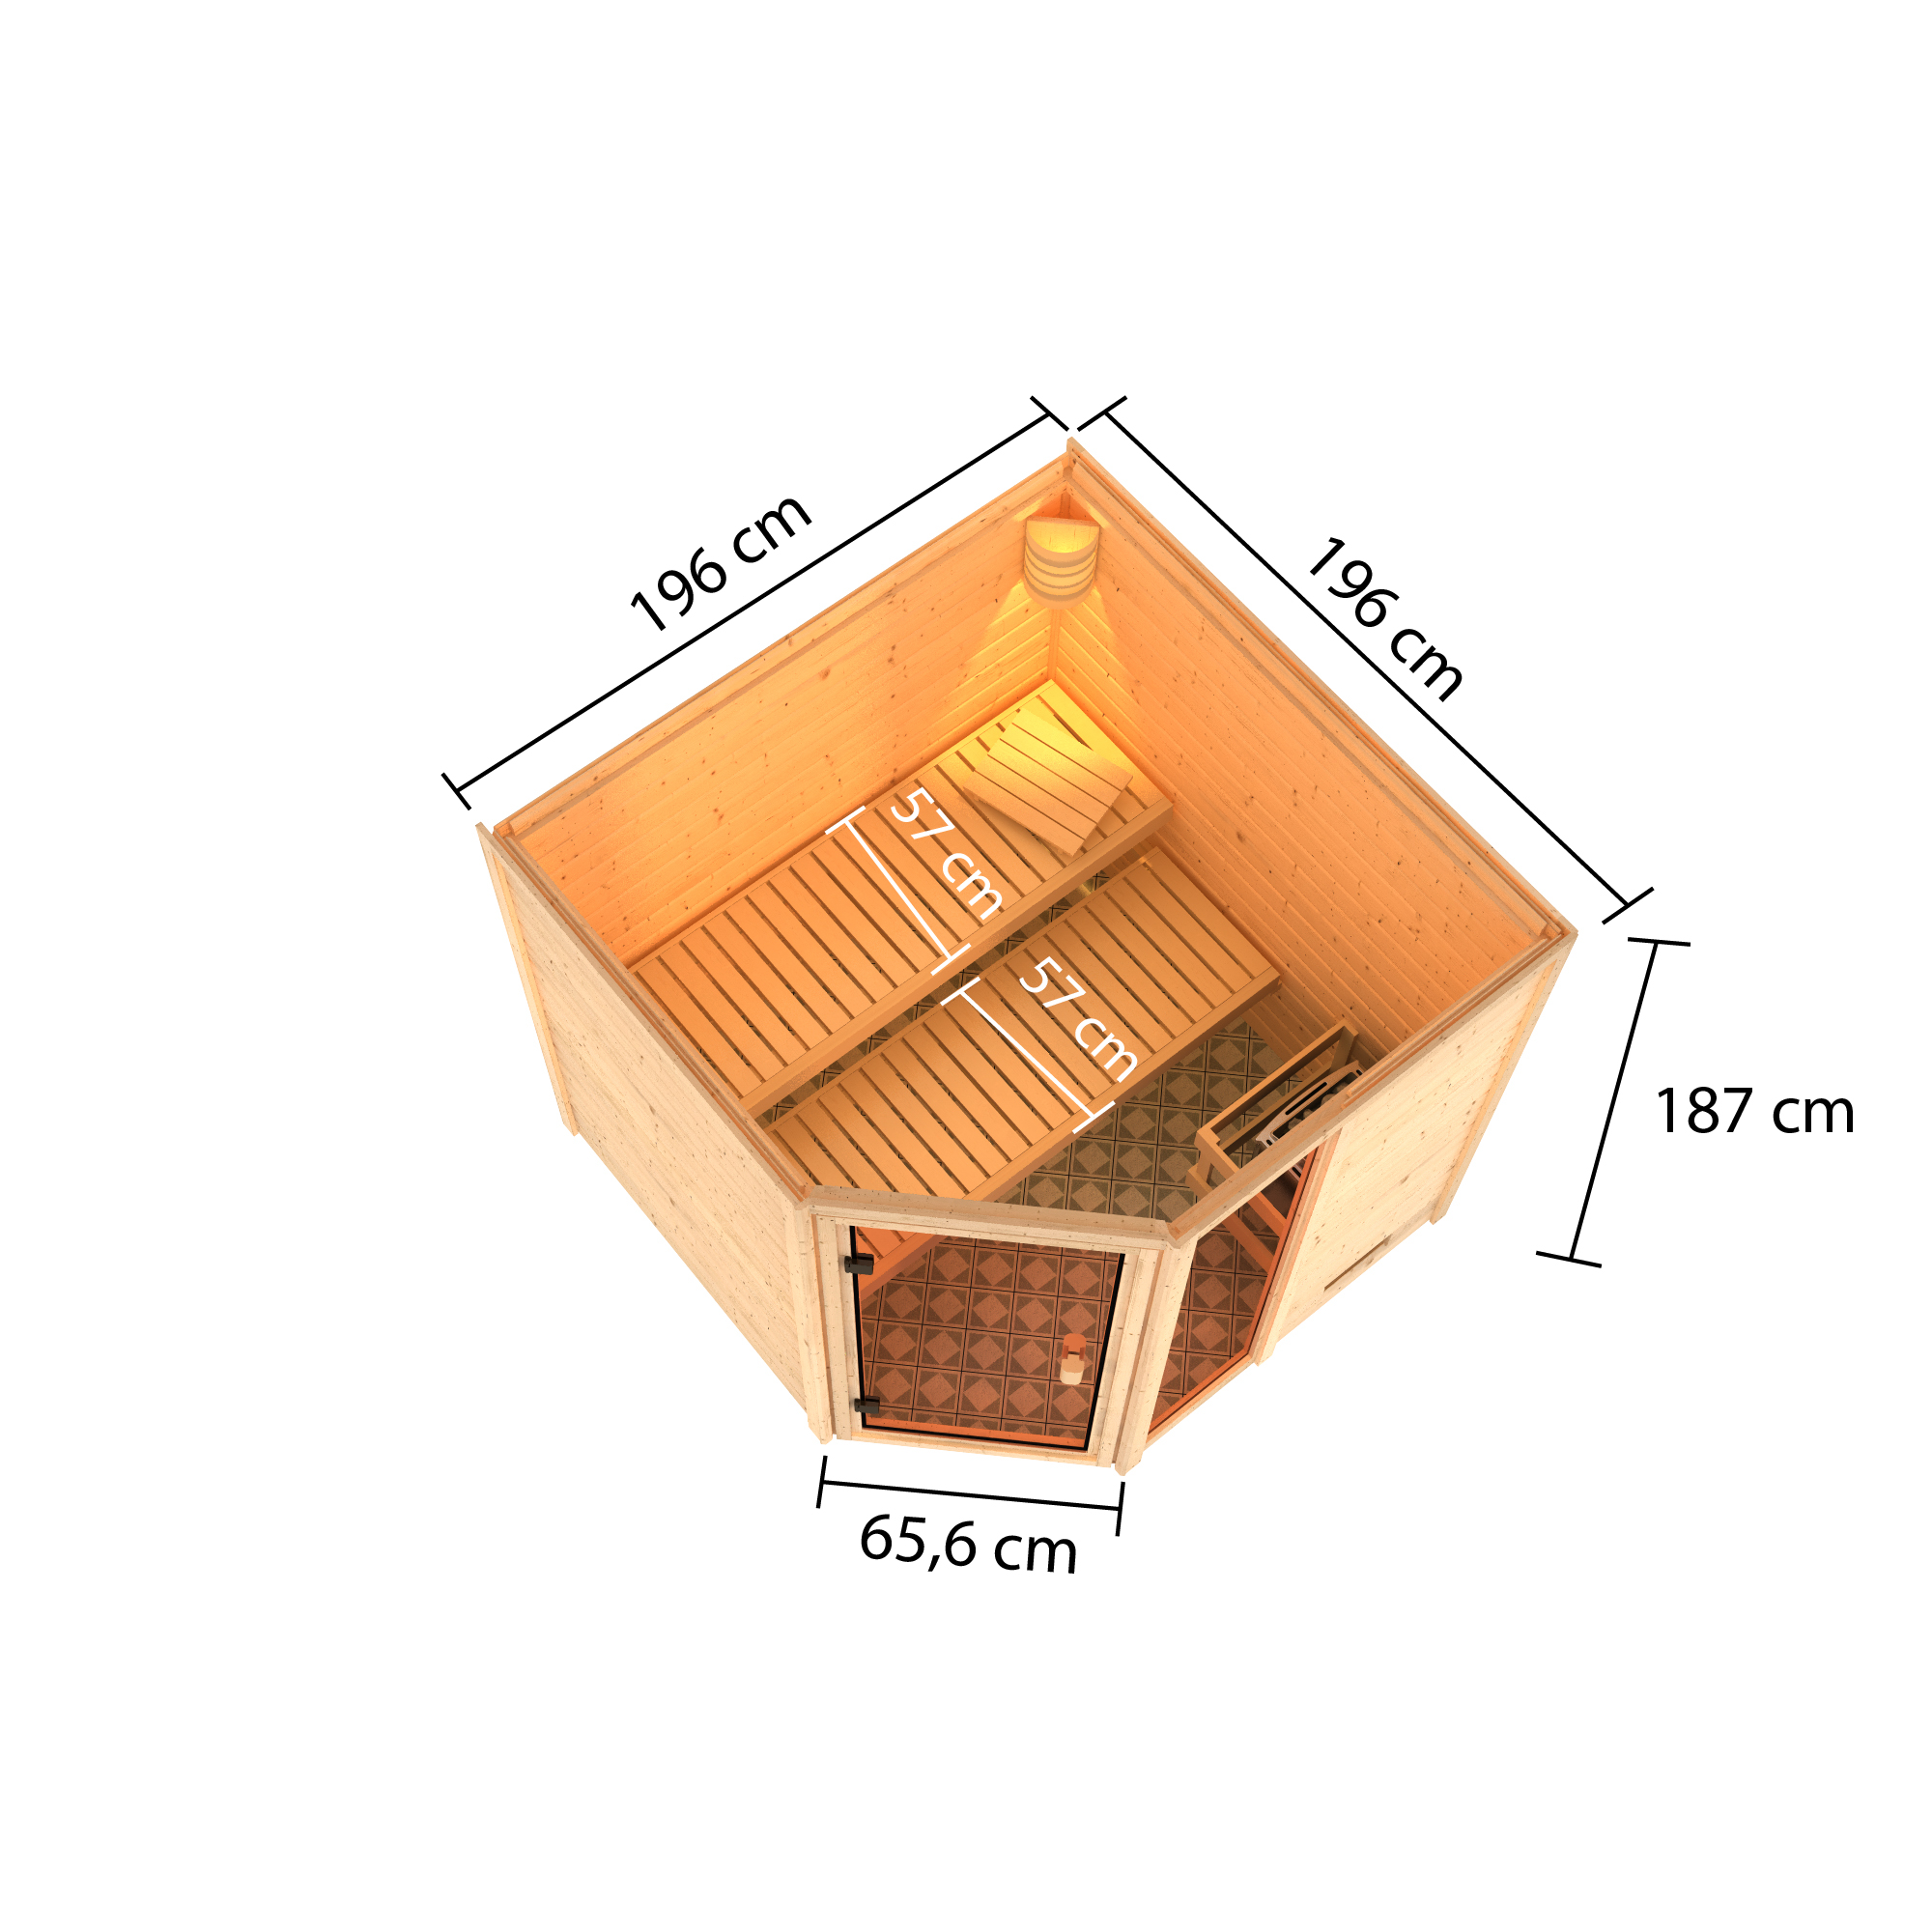 Woodfeeling Sauna Tabea 38mm ohne Saunaofen Bild 3